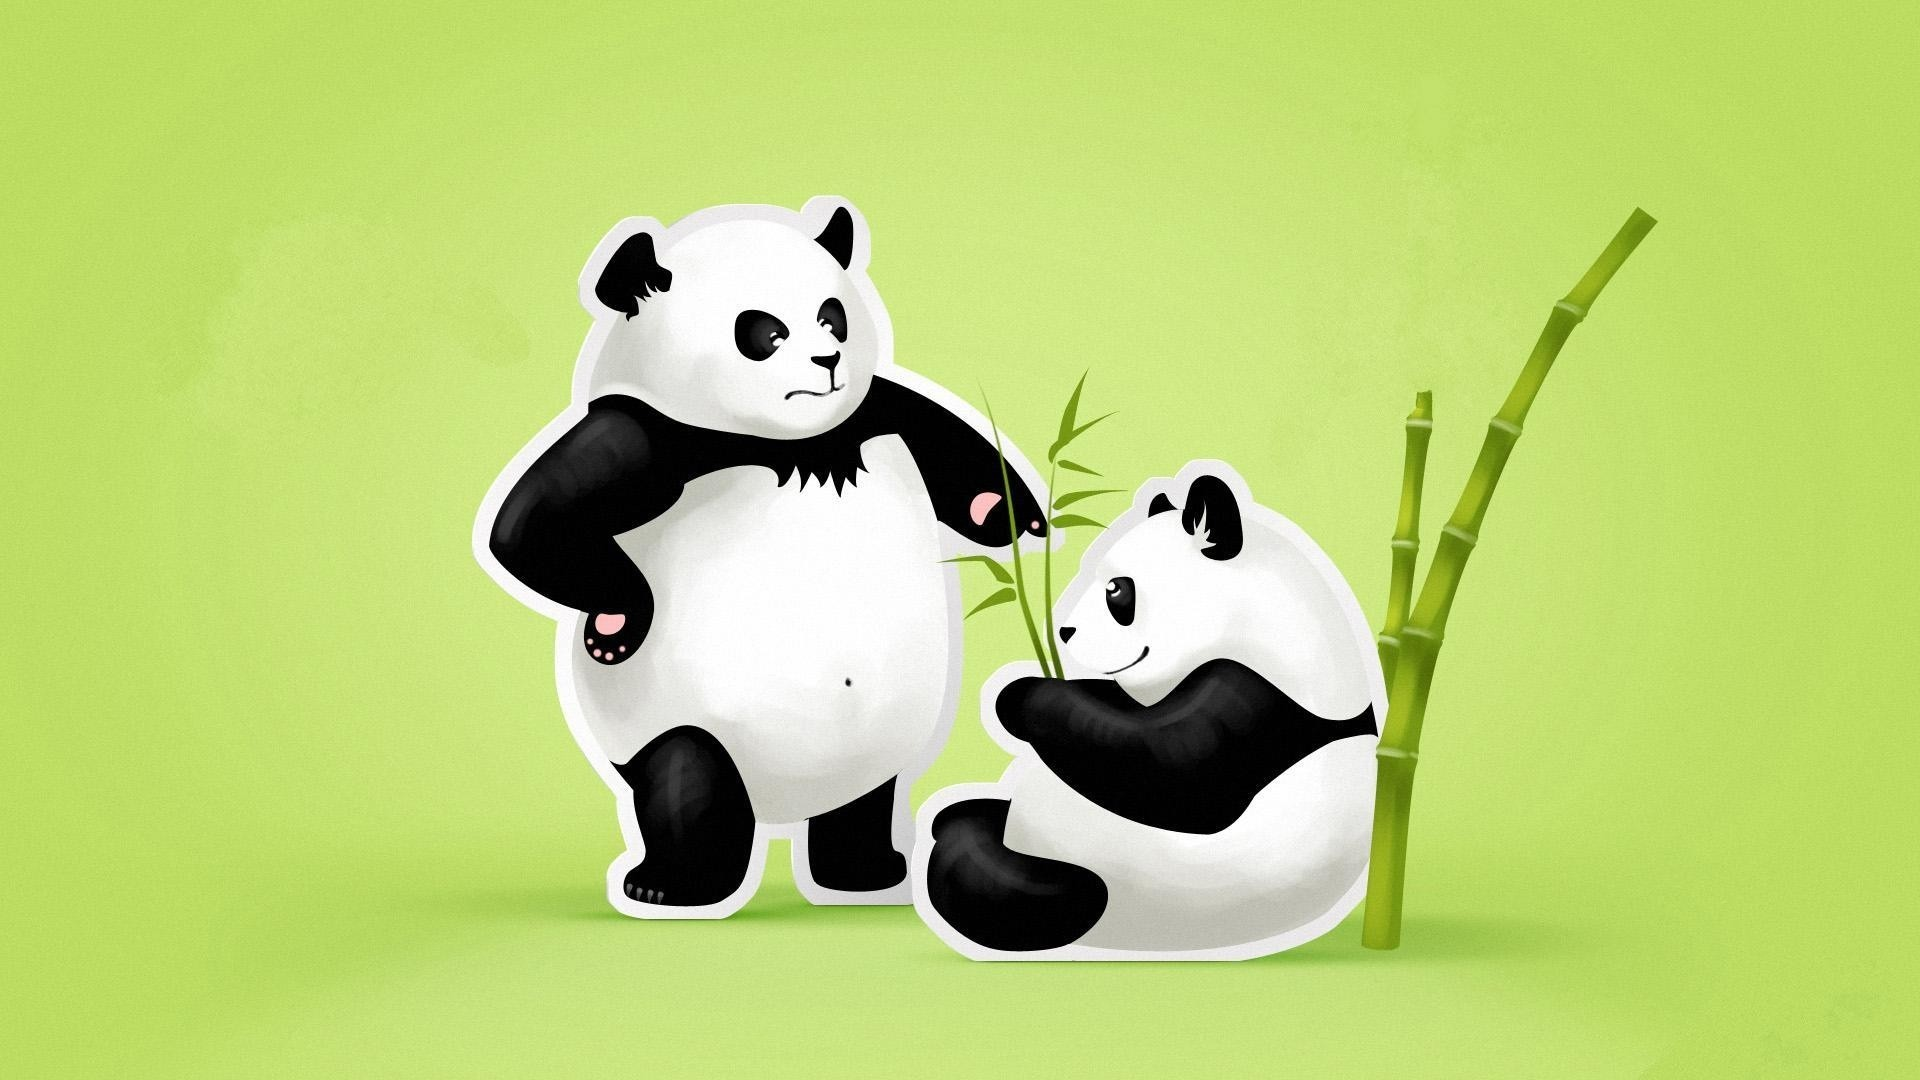 Res: 1920x1080, Cute Panda Couple Wallpaper HD